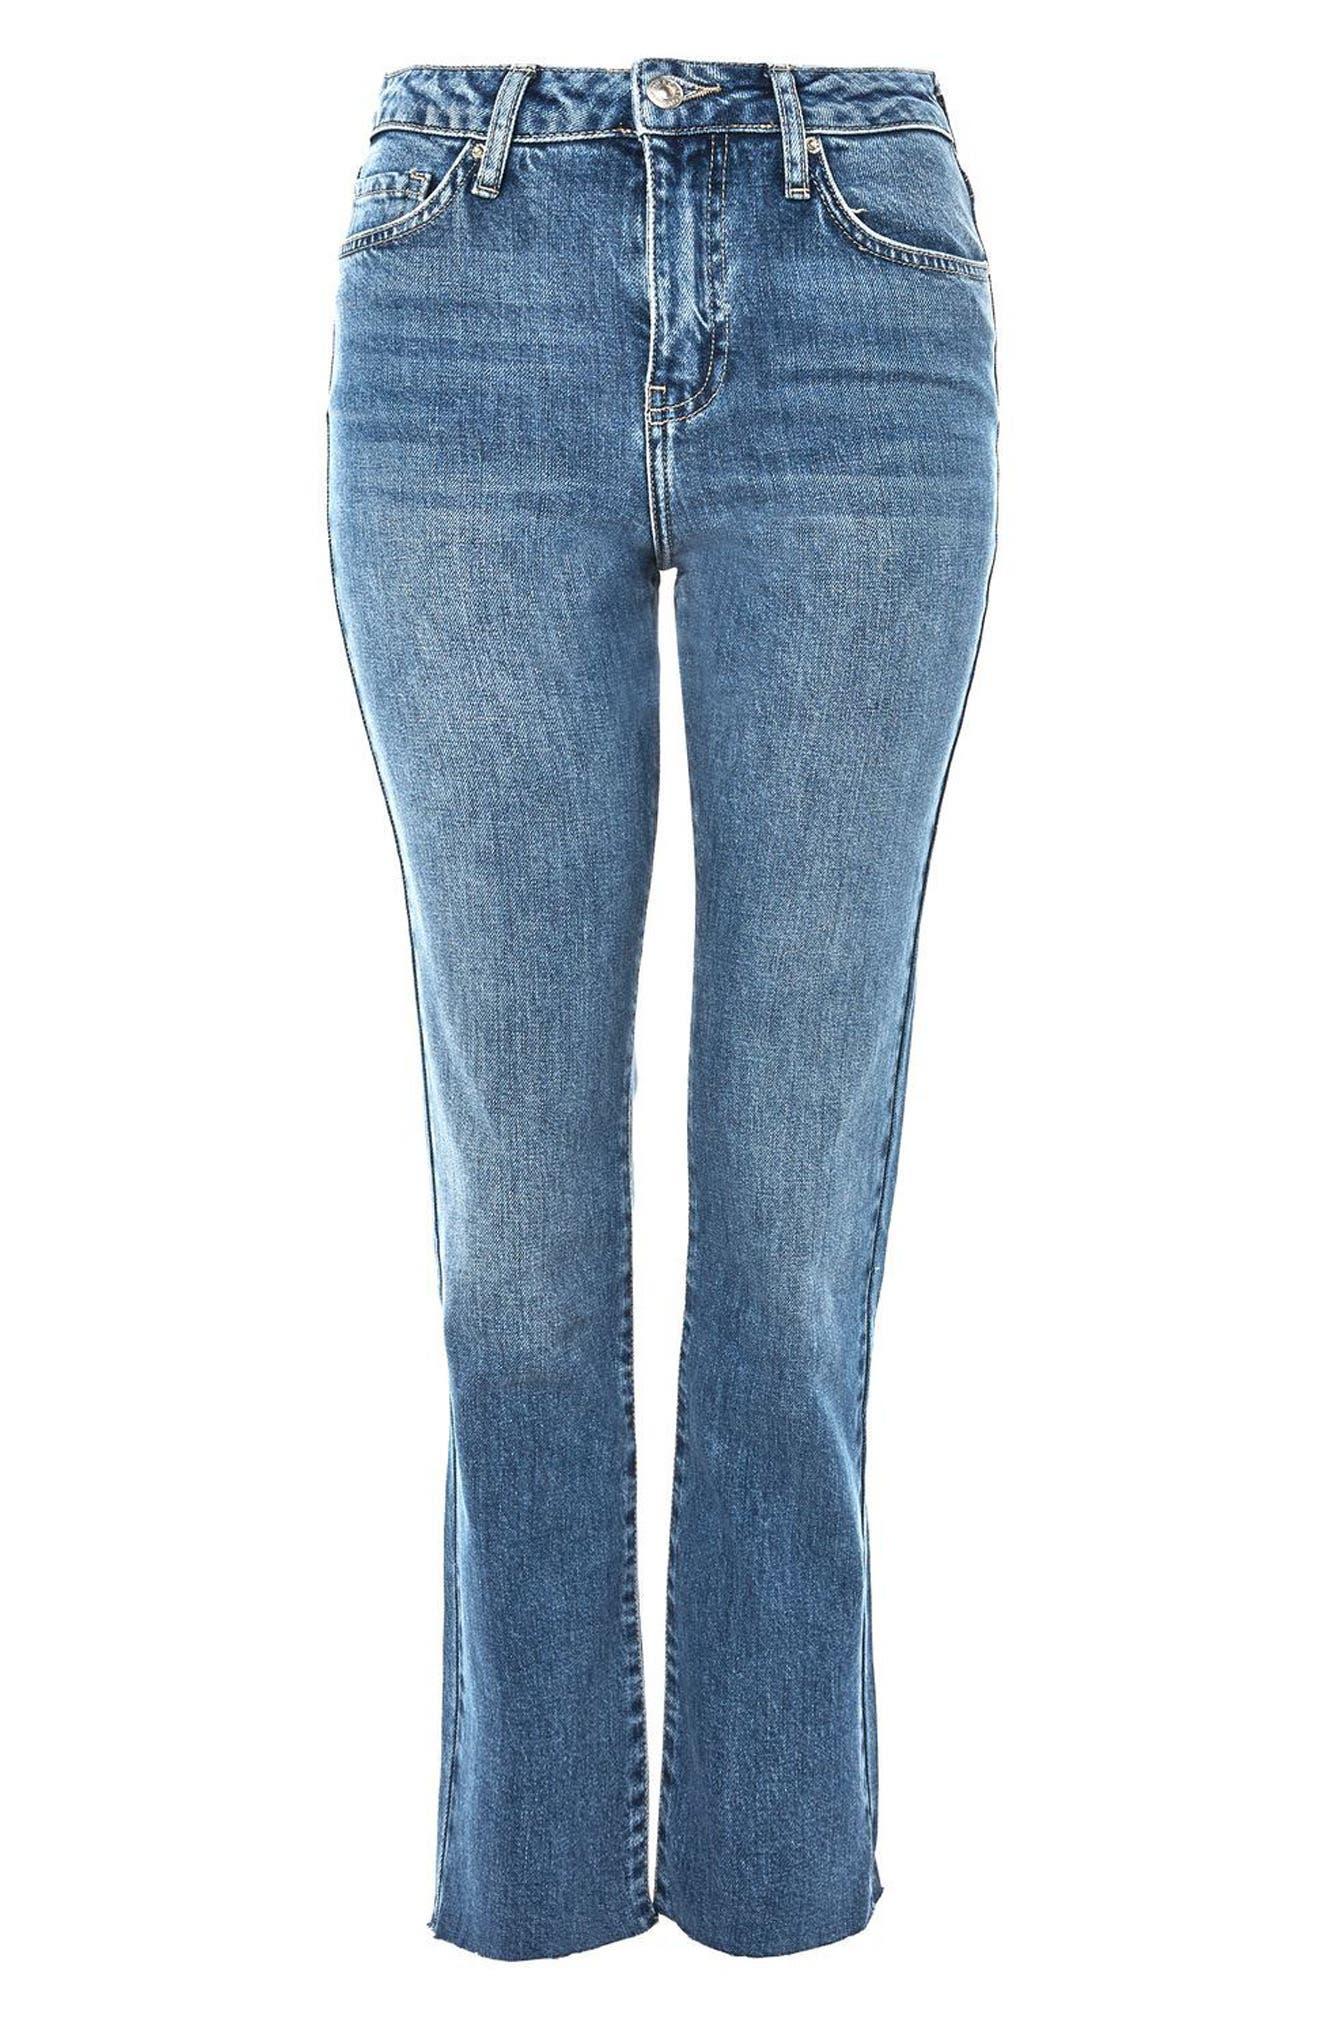 Dree Raw Hem Crop Flare Jeans,                             Alternate thumbnail 3, color,                             400